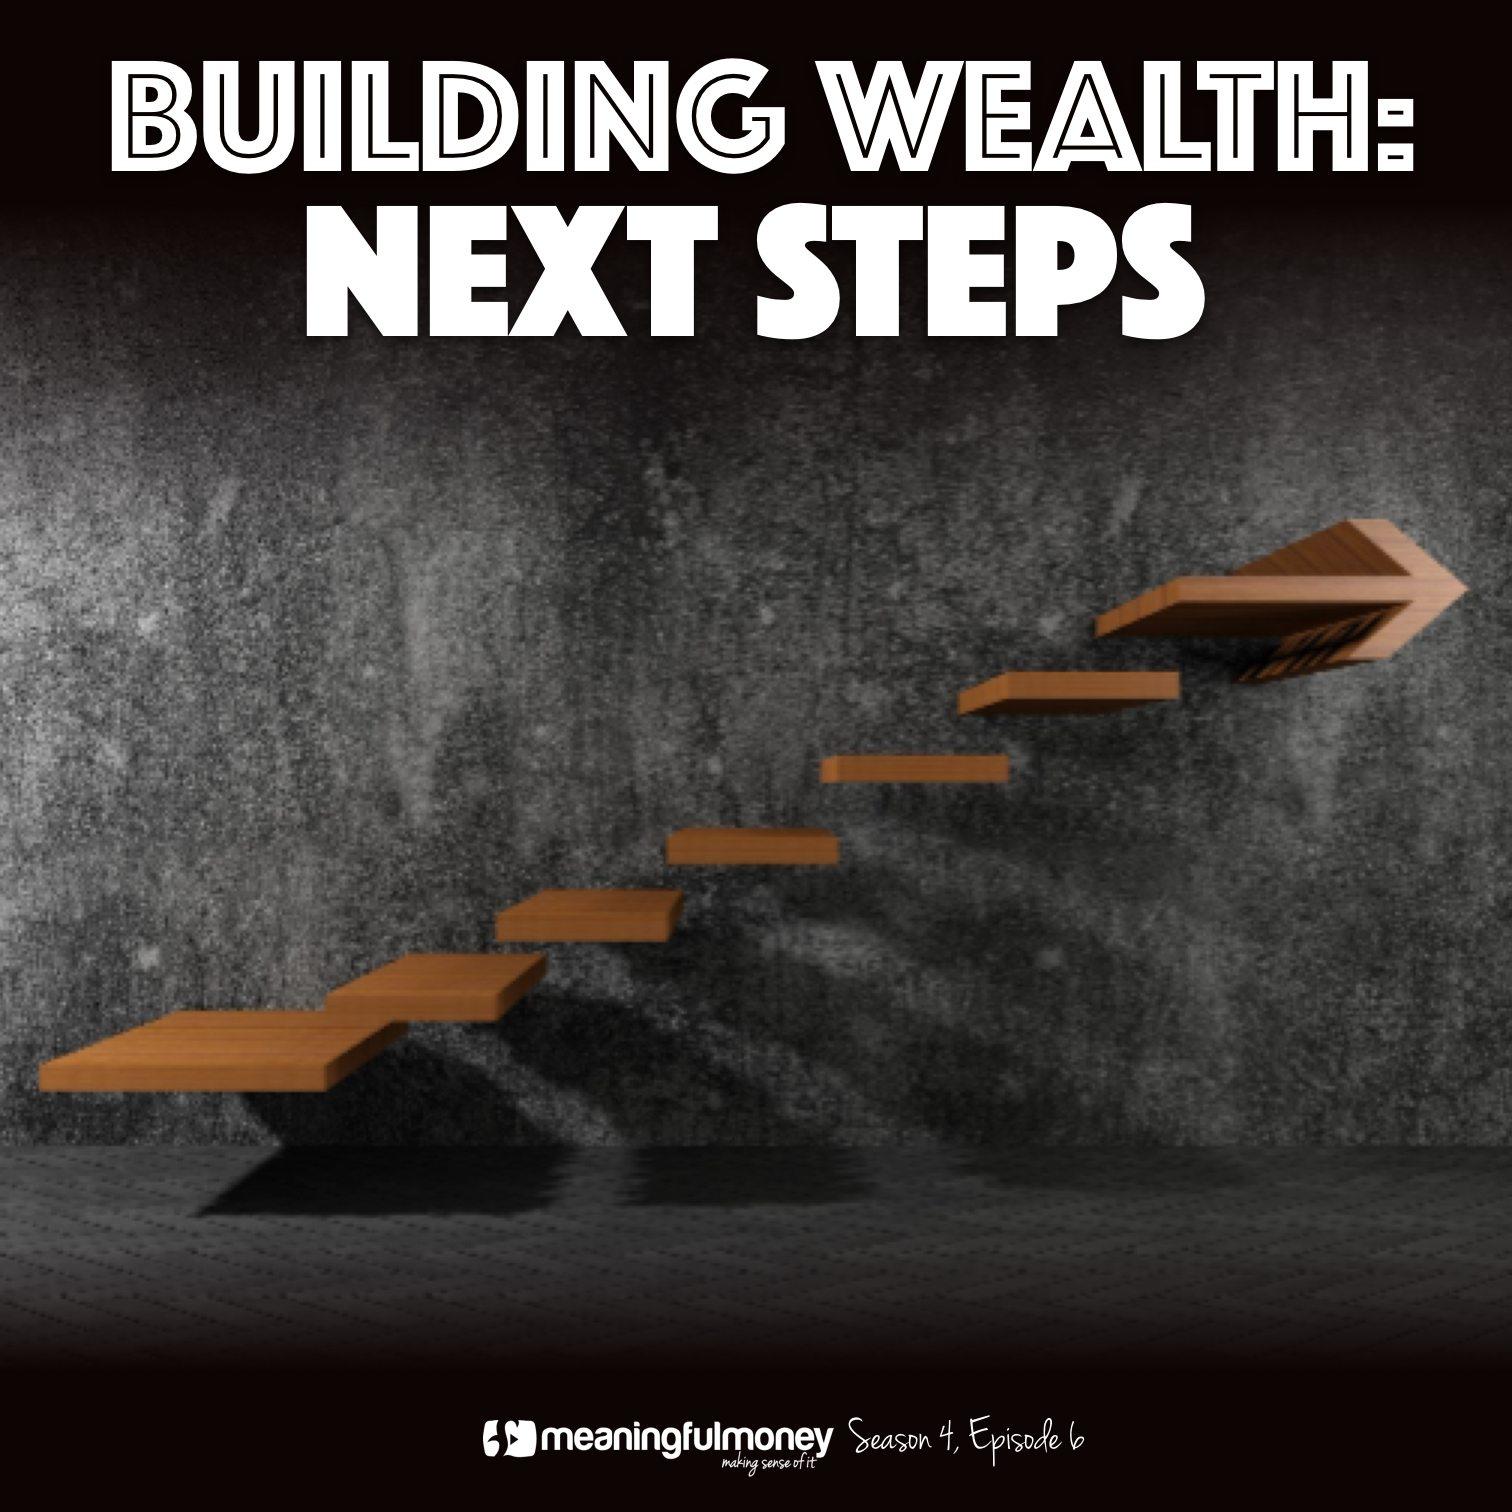 Building Wealth: Next Steps